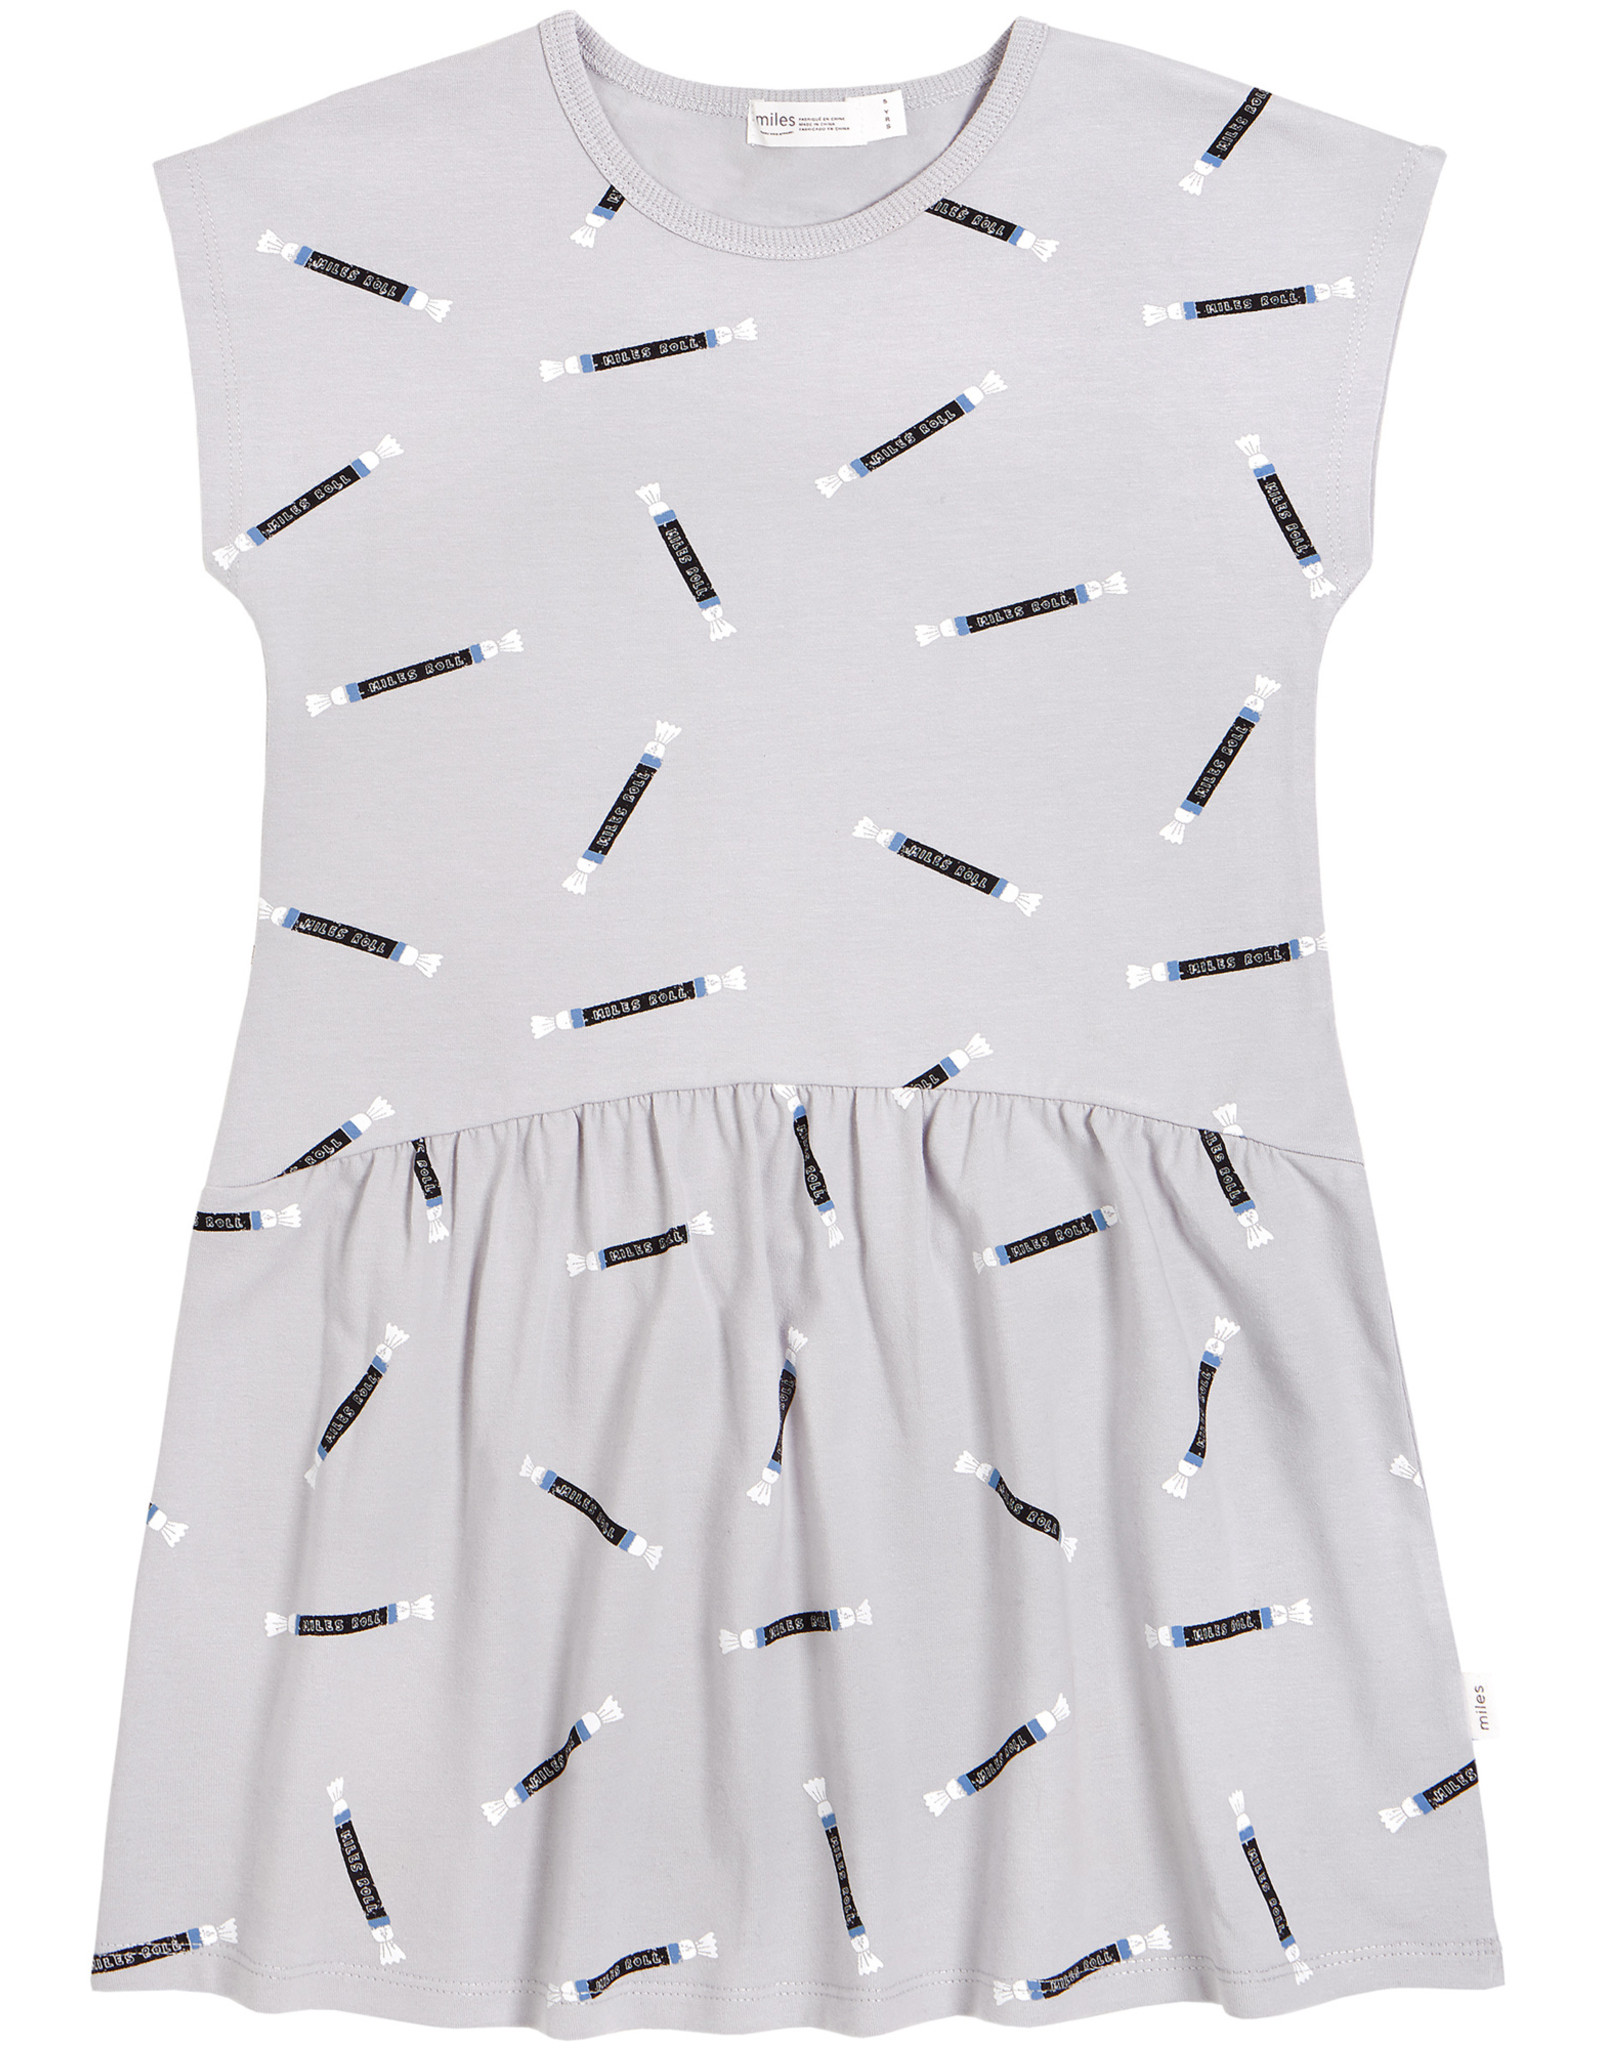 Miles Roll Dress